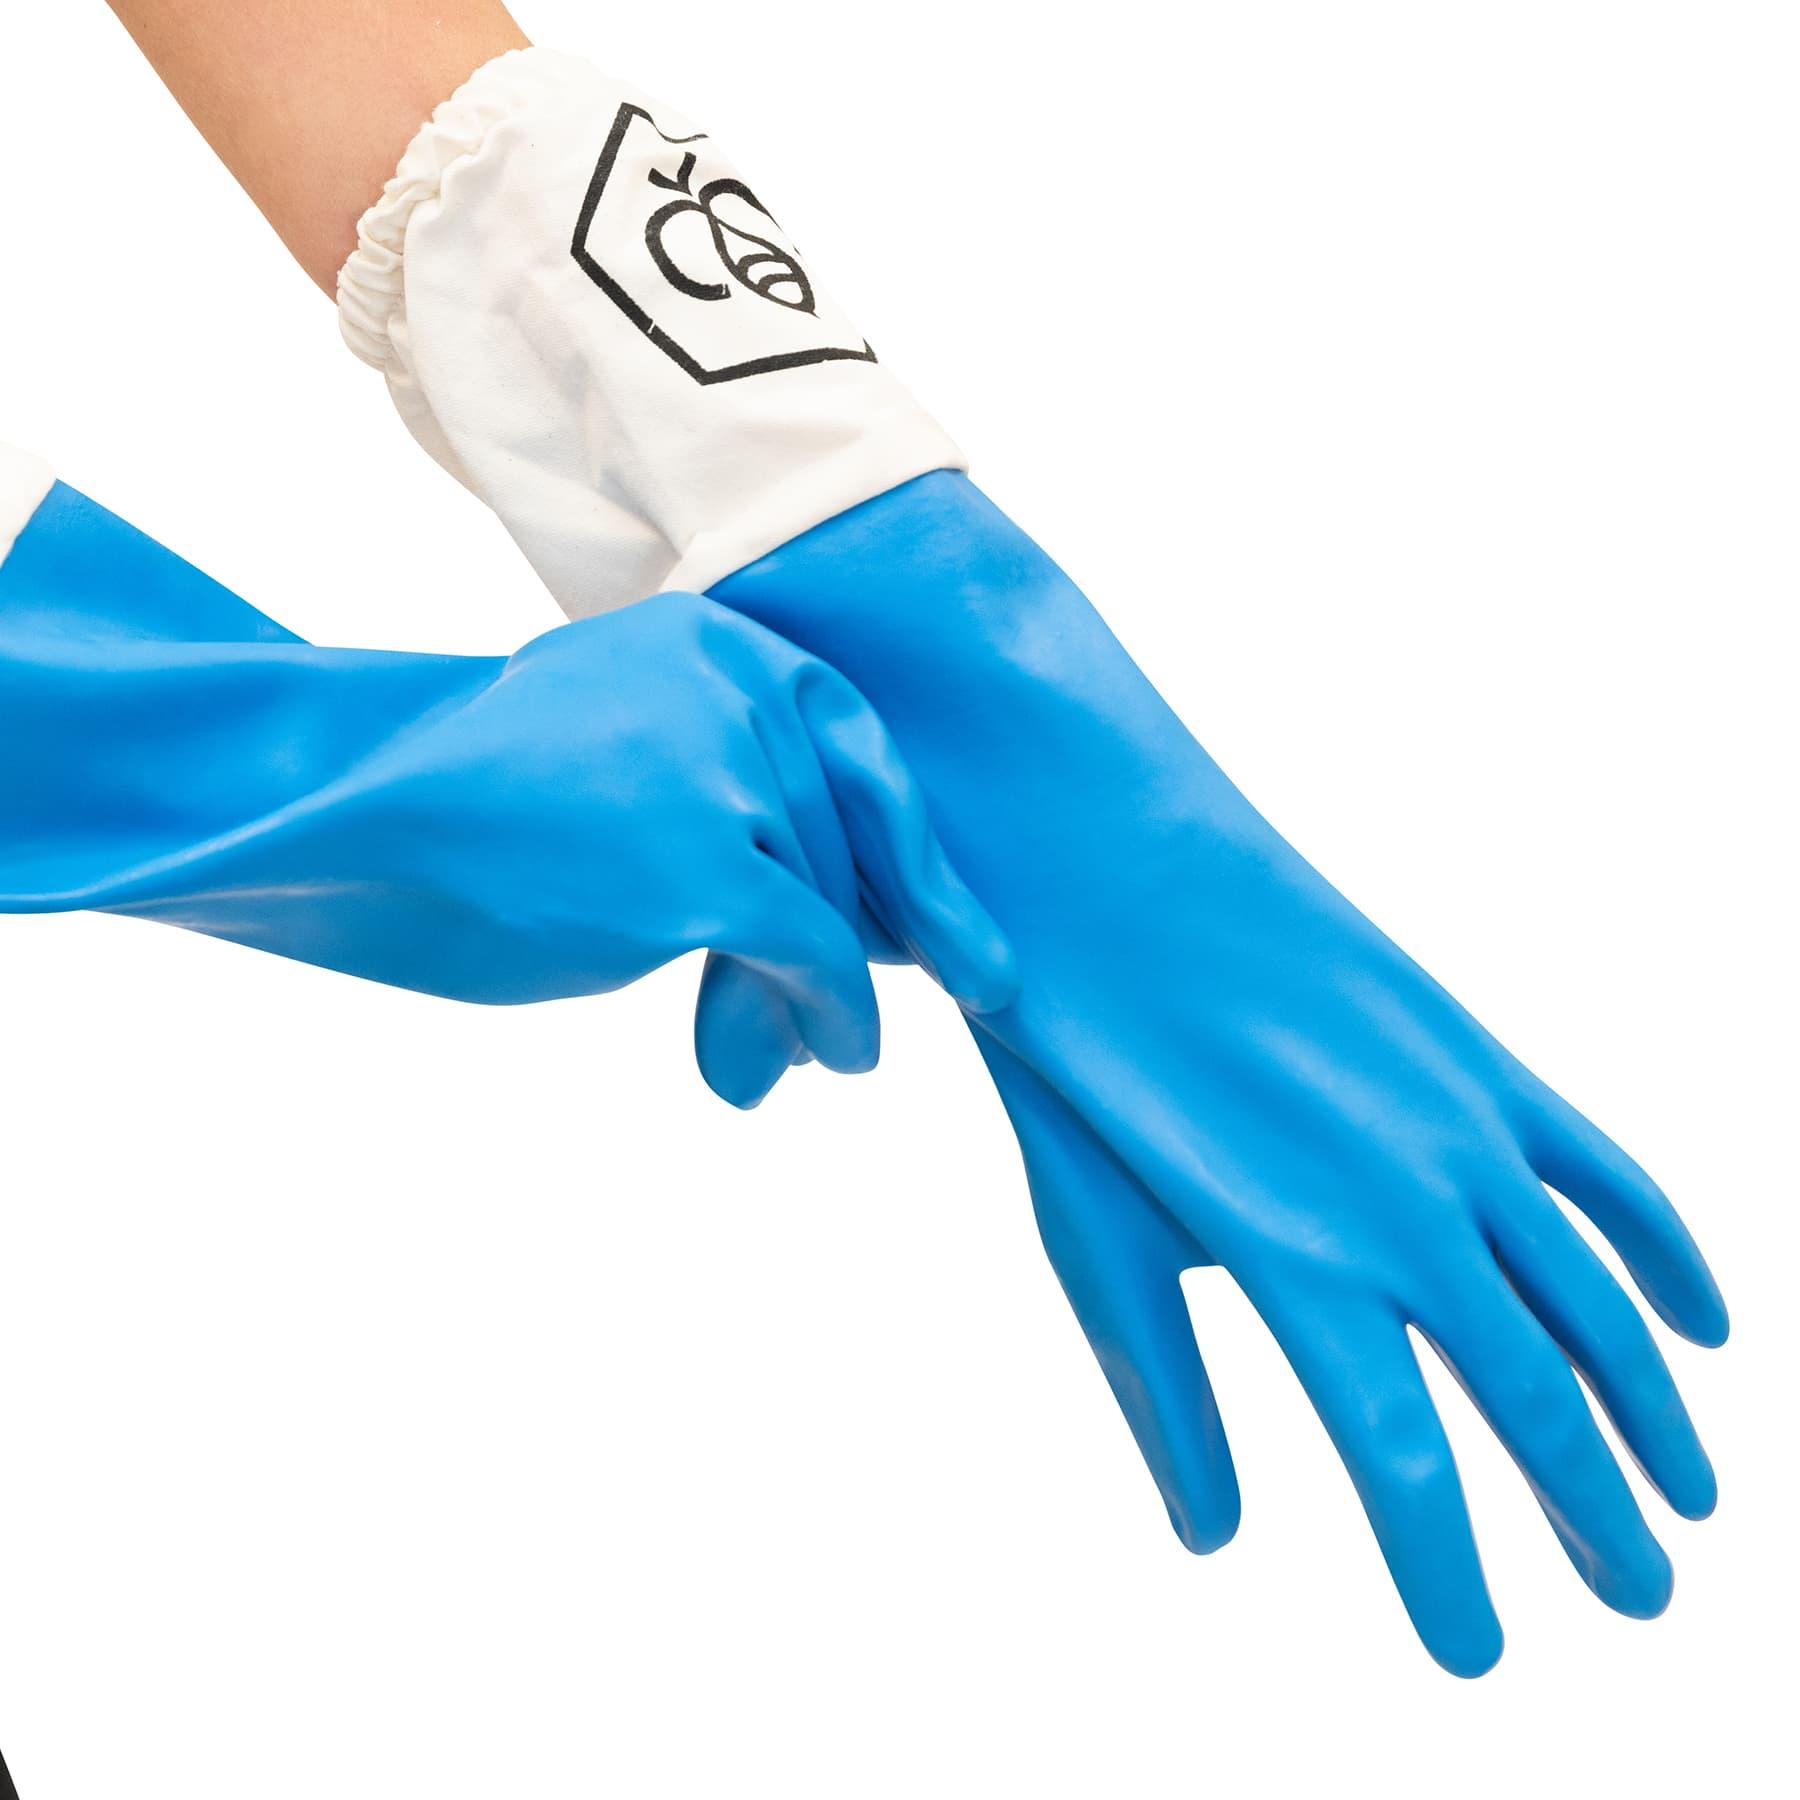 Gummihandschuhe hellblau mit Stulpe Gr. 8 (S)